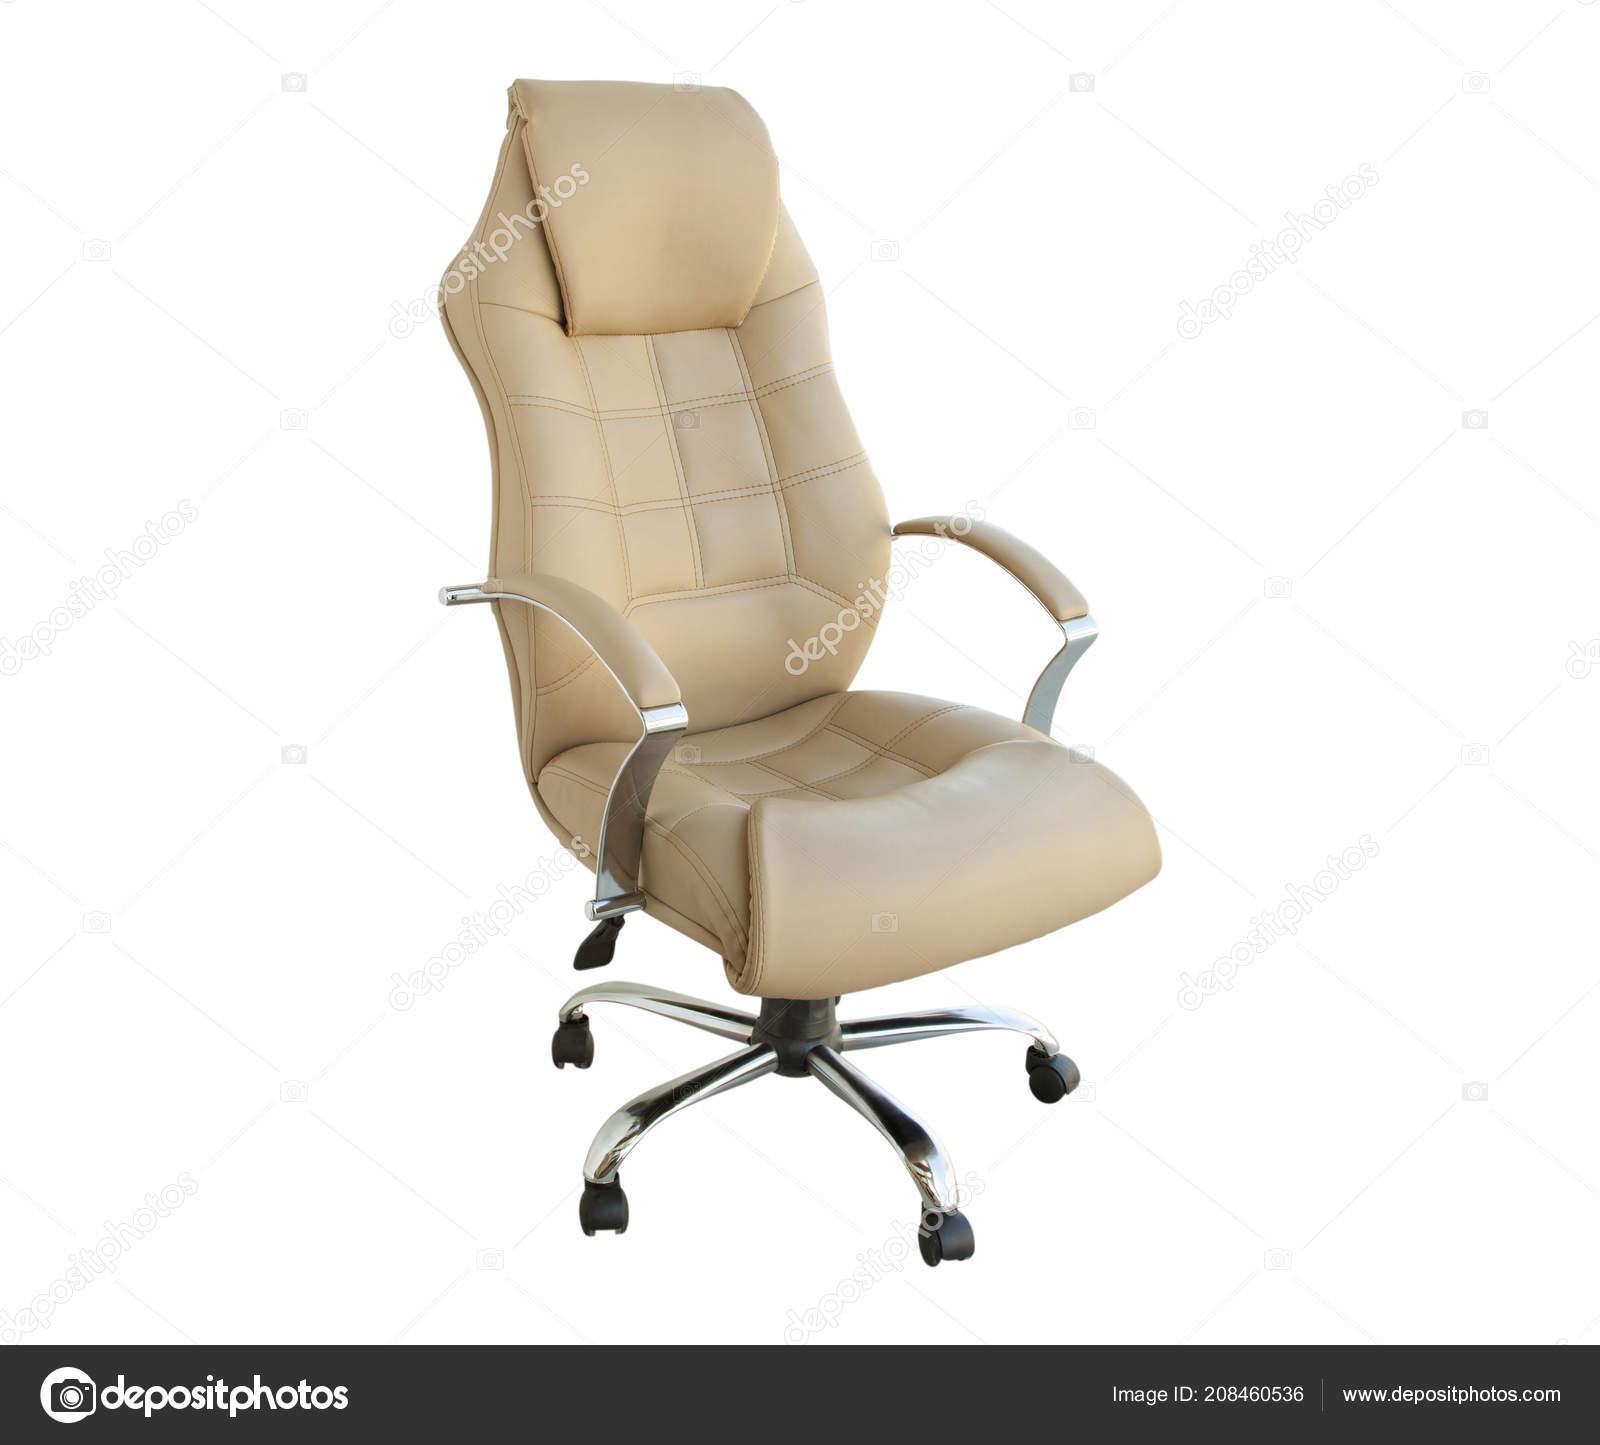 Moderne Lederen Bureaustoel.Moderne Leren Bureaustoel Stockfoto C Reflex Safak 208460536